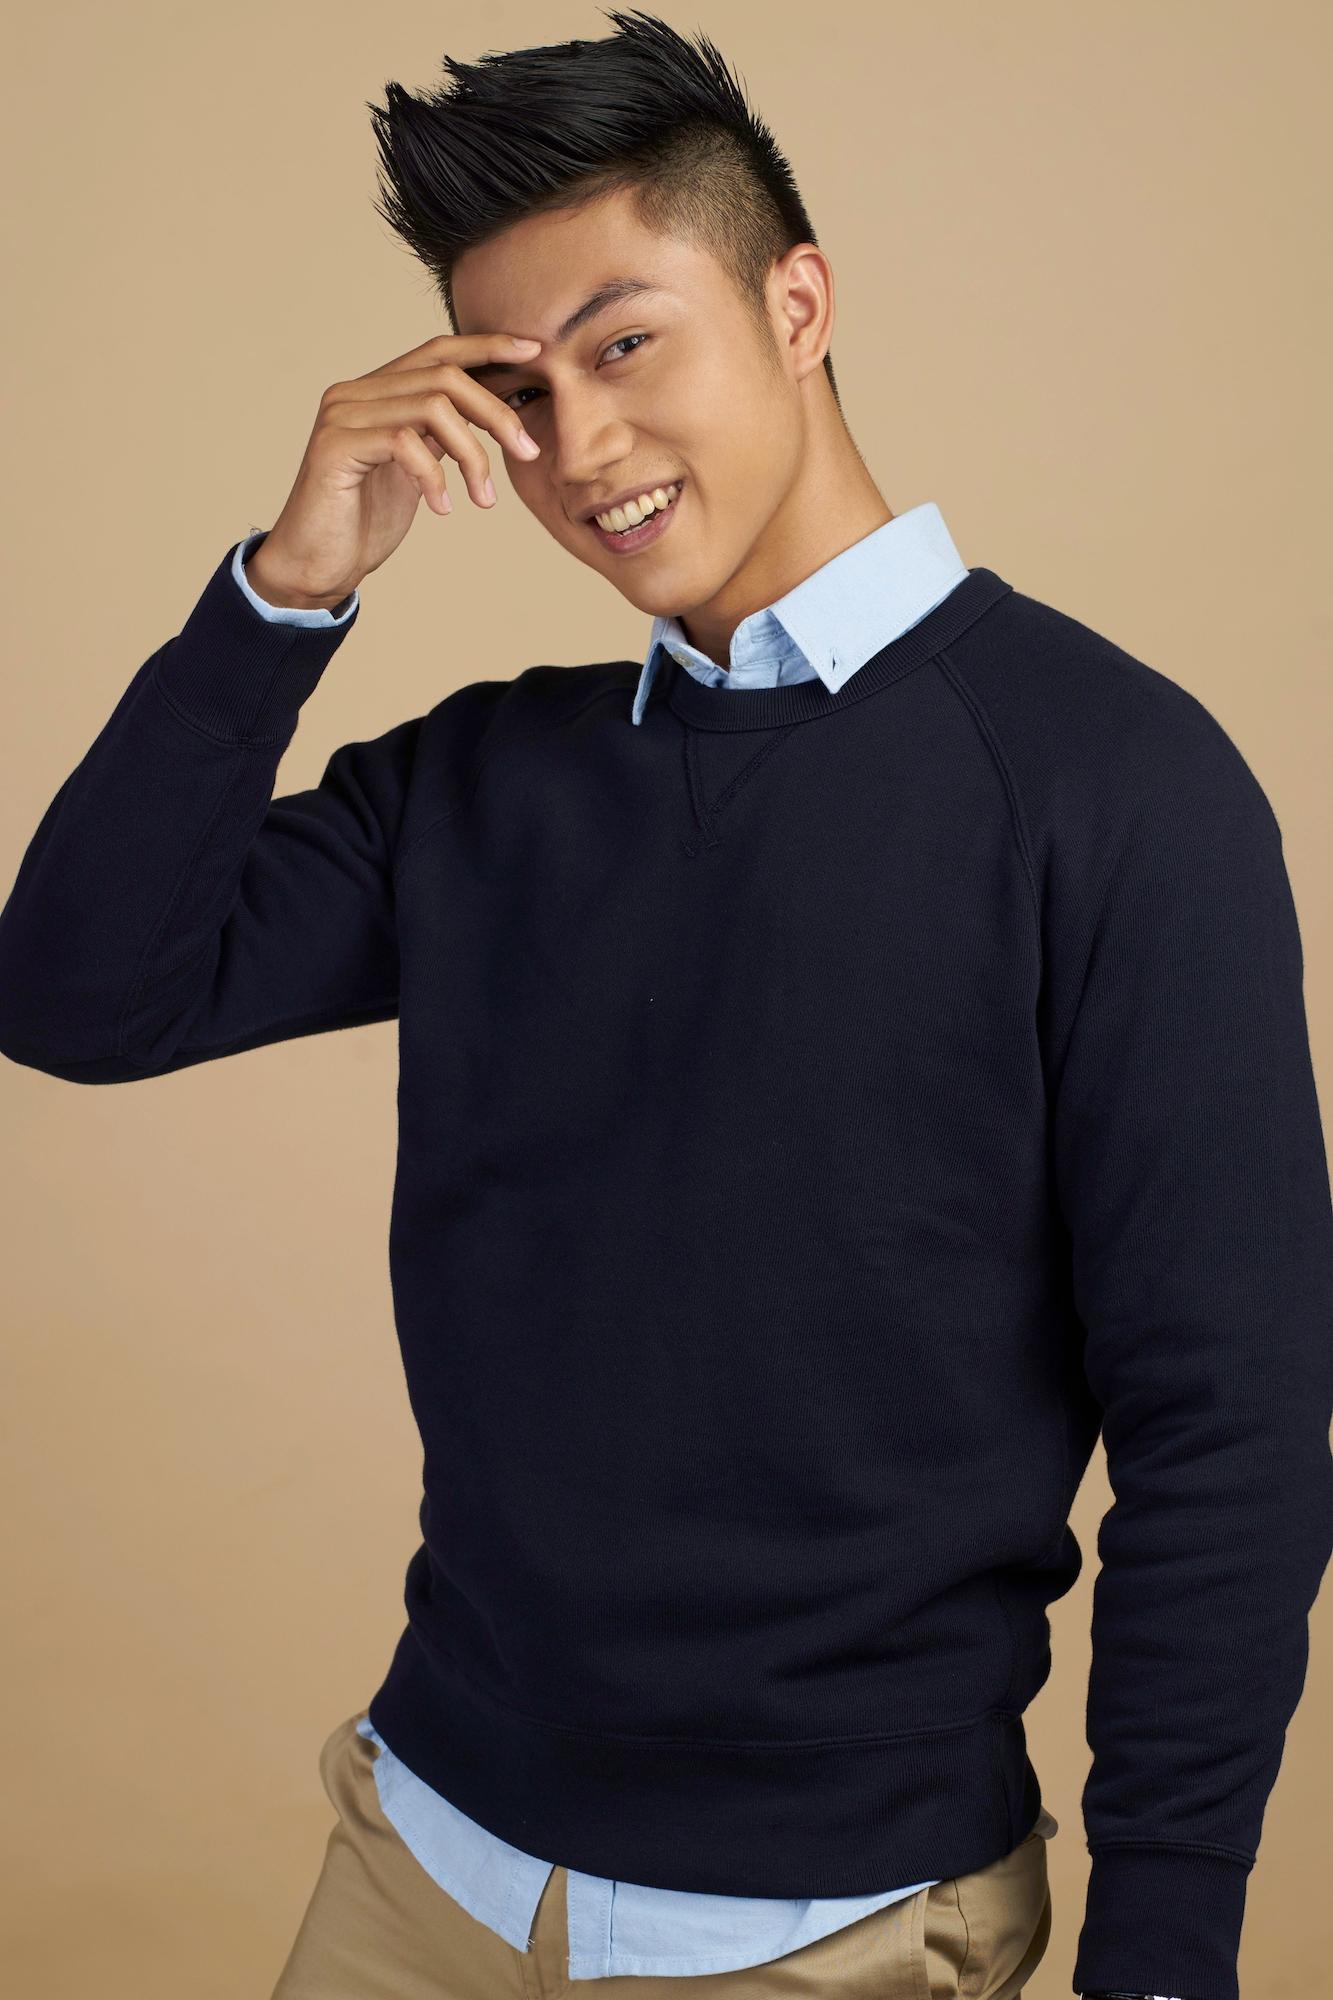 Pria asia dengan model rambut faux gawk dan sweater hitam kemeja biru Gaya